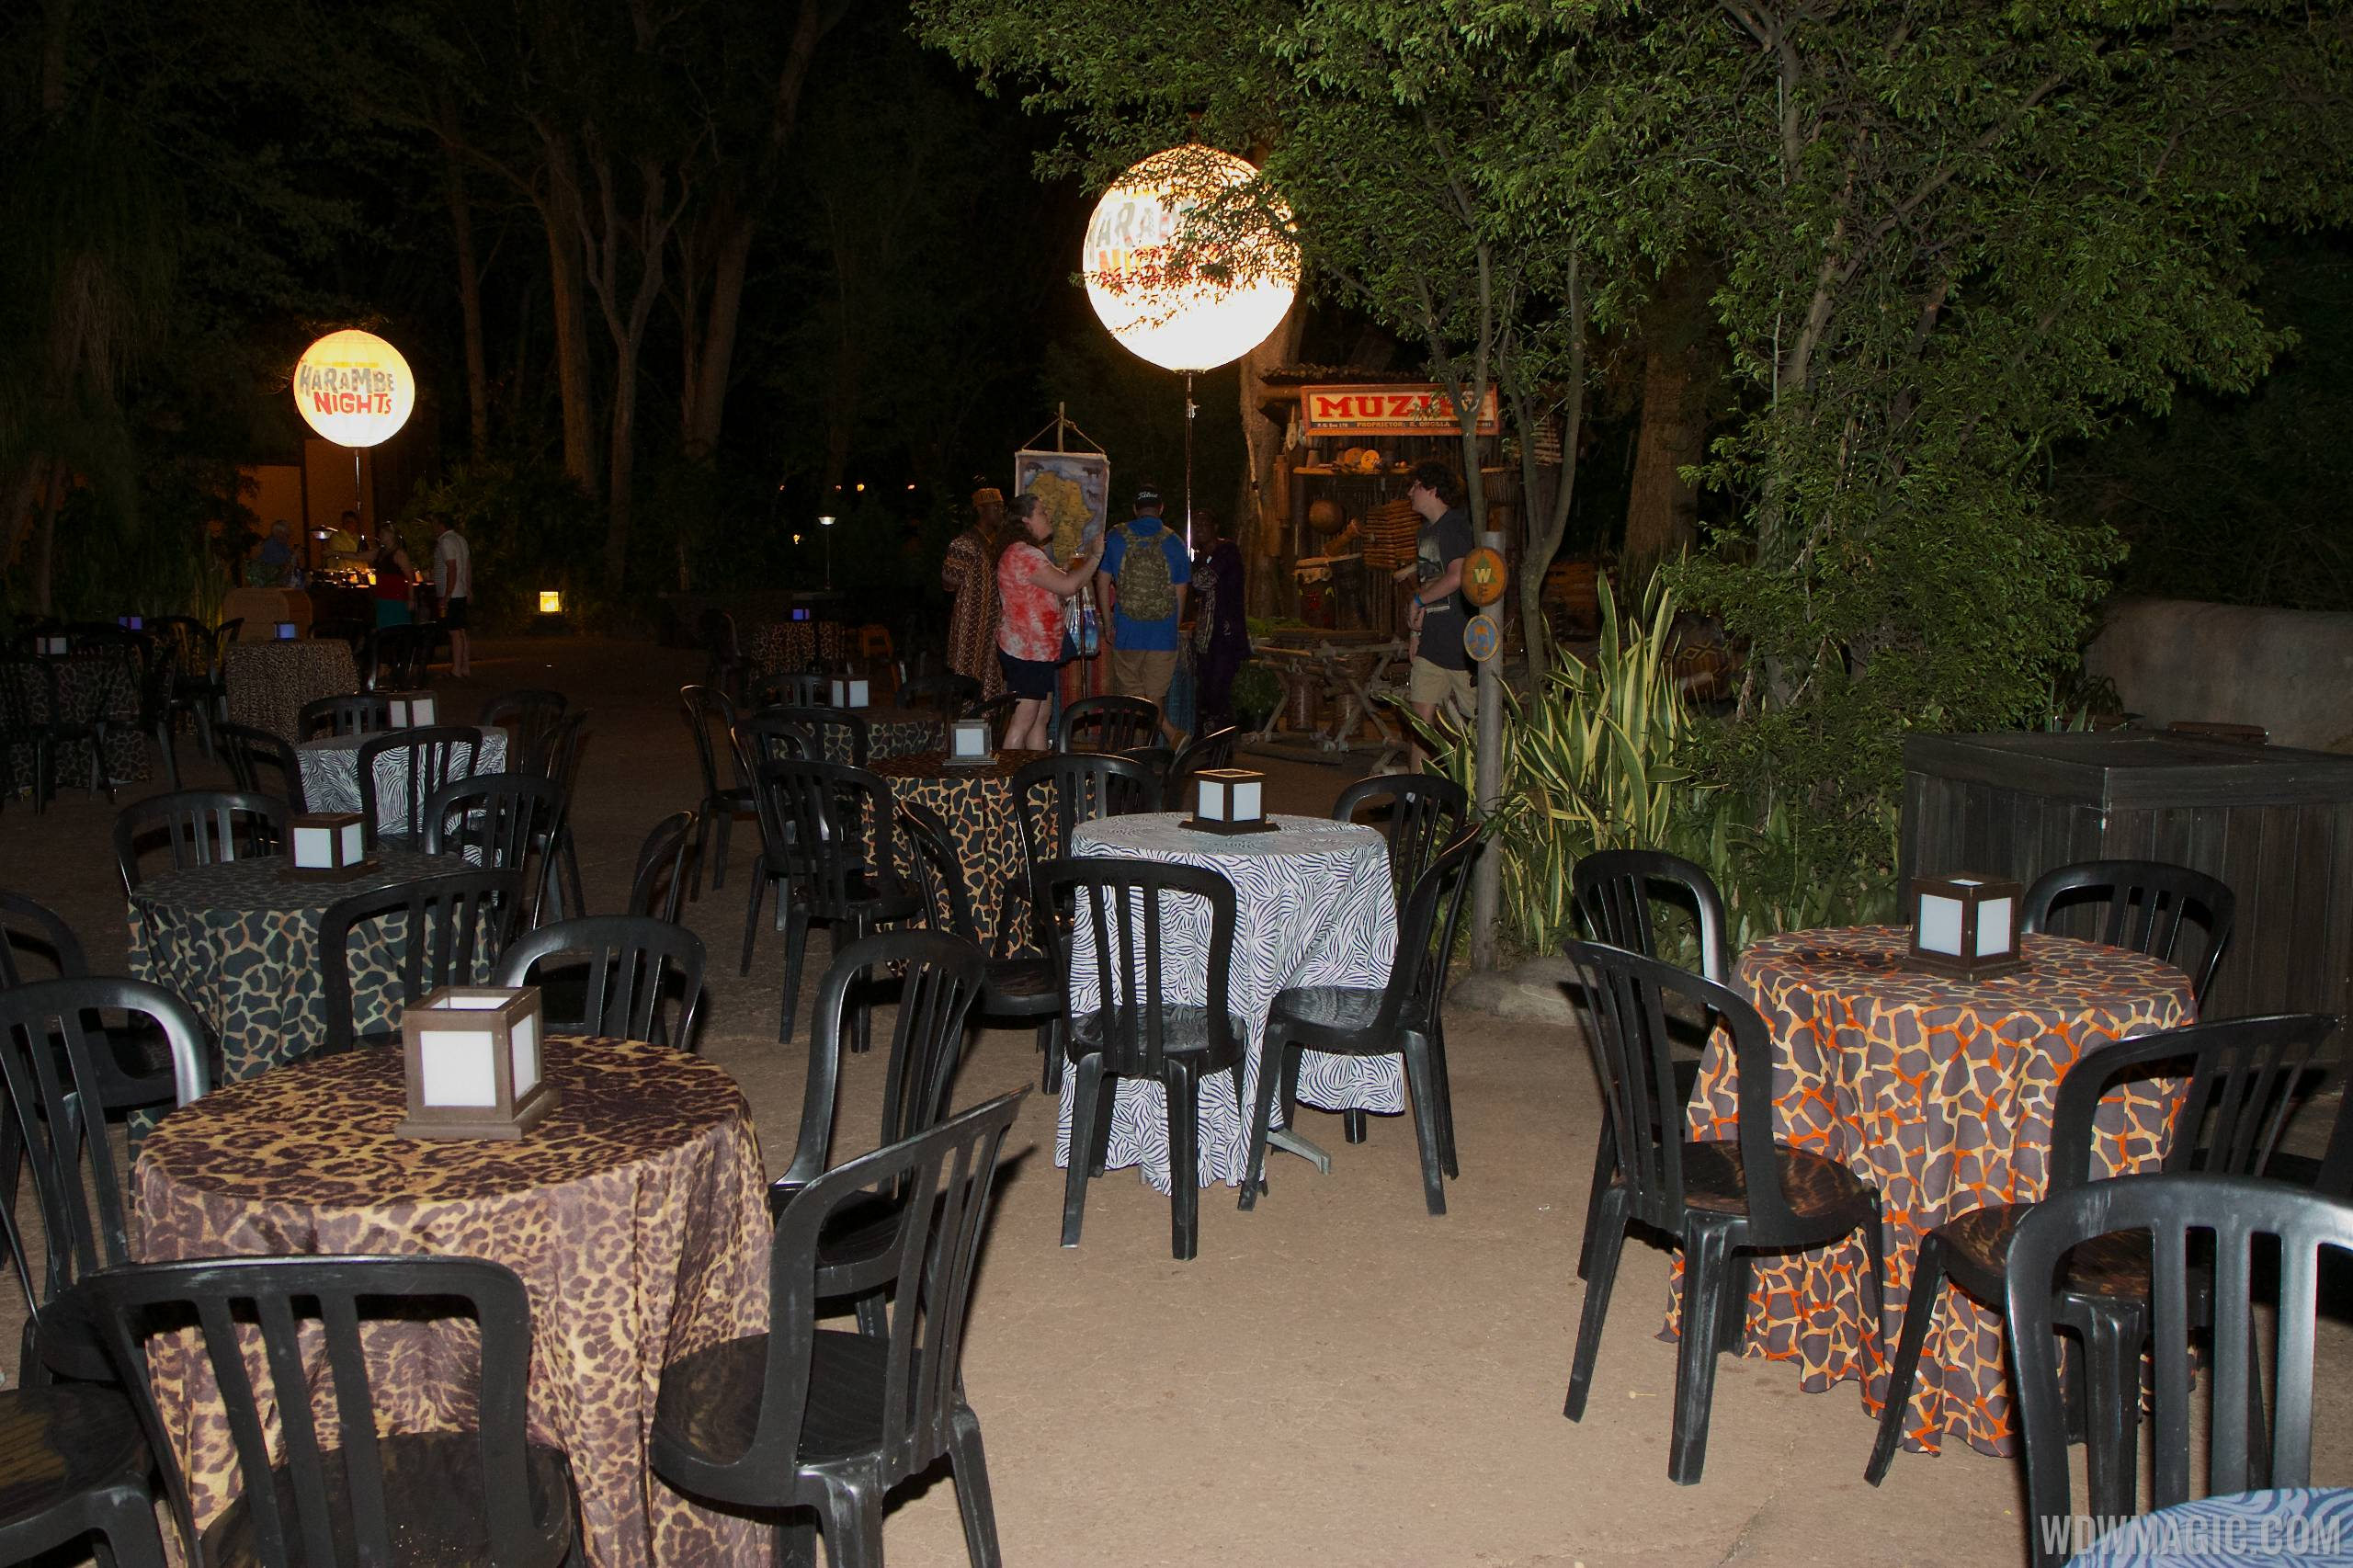 Harambe Nights - Outdoor seating stations